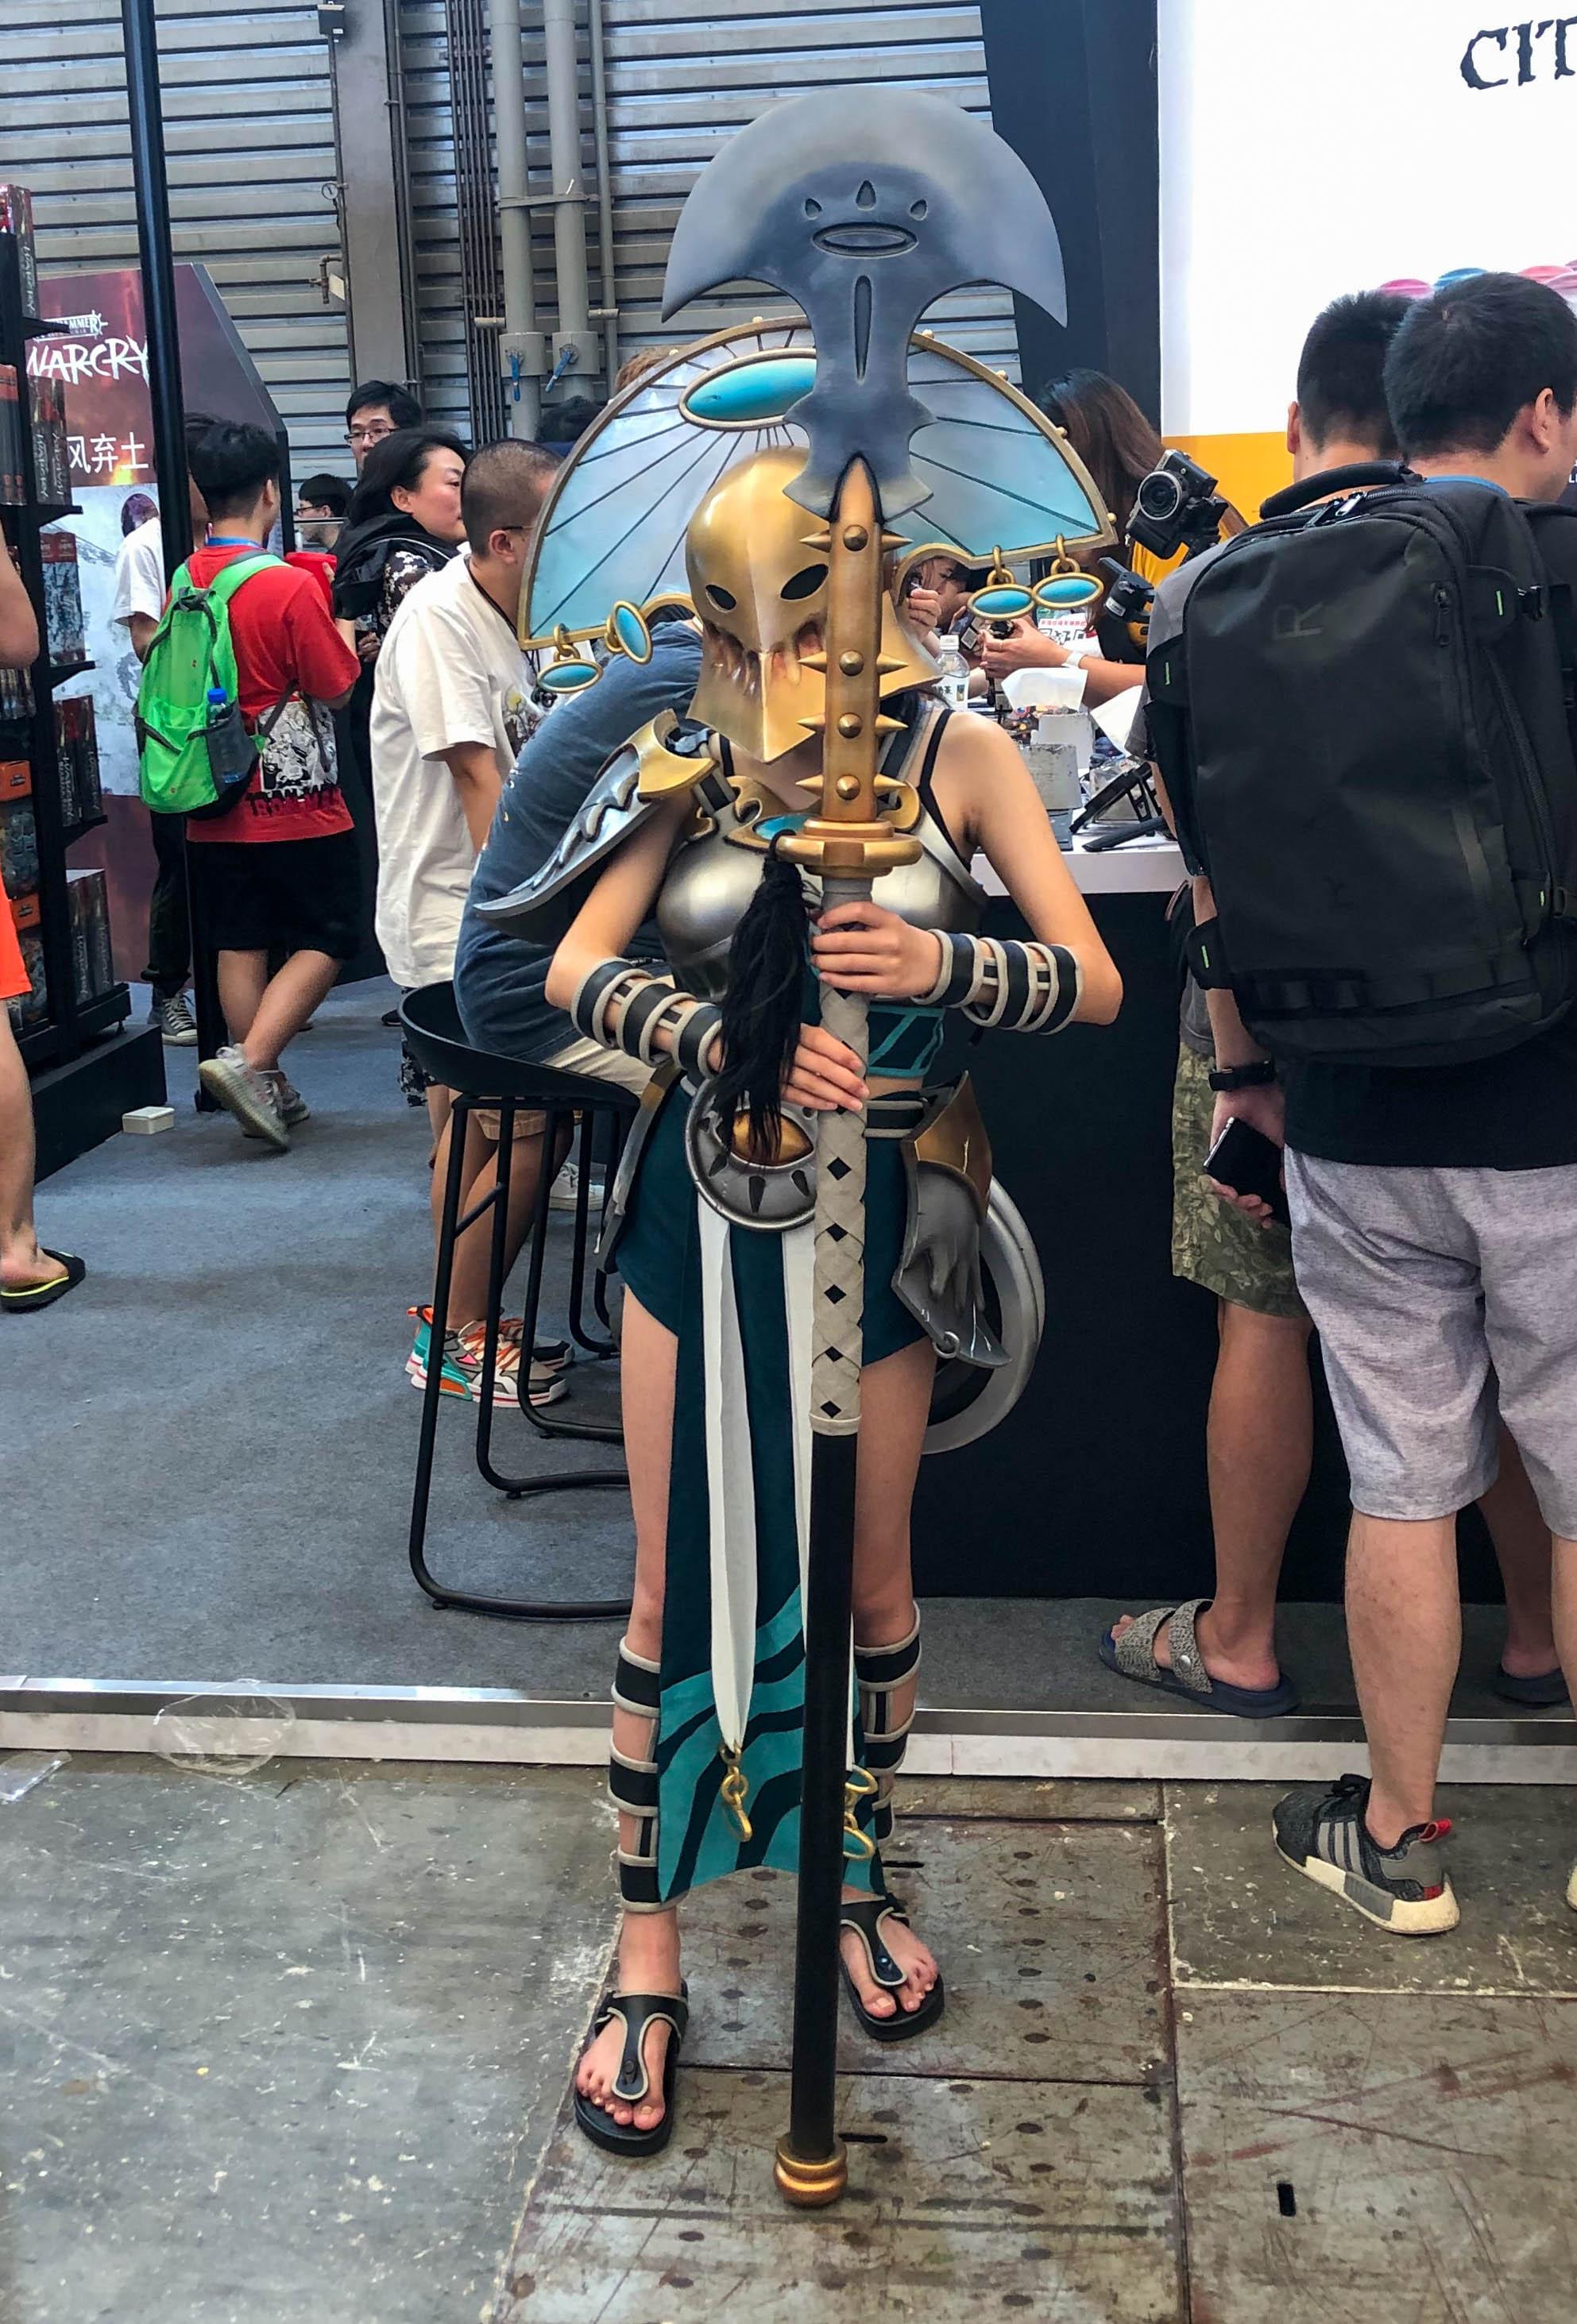 2019 ChinaJoy 中国国际数码互动娱乐展览会 游玩 第34张